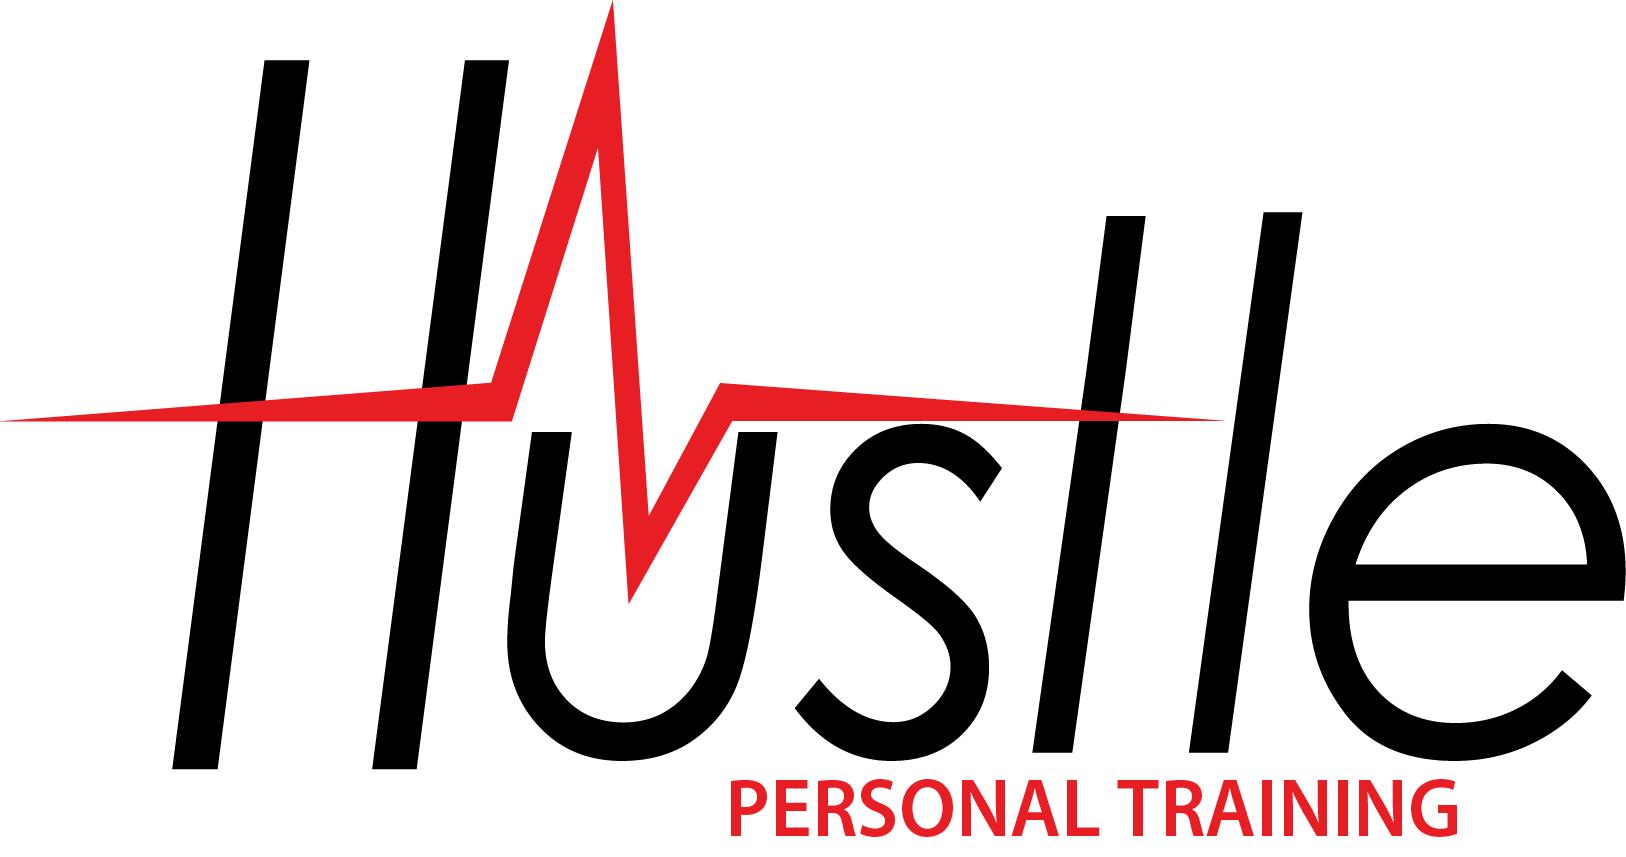 Hustle Personal Training